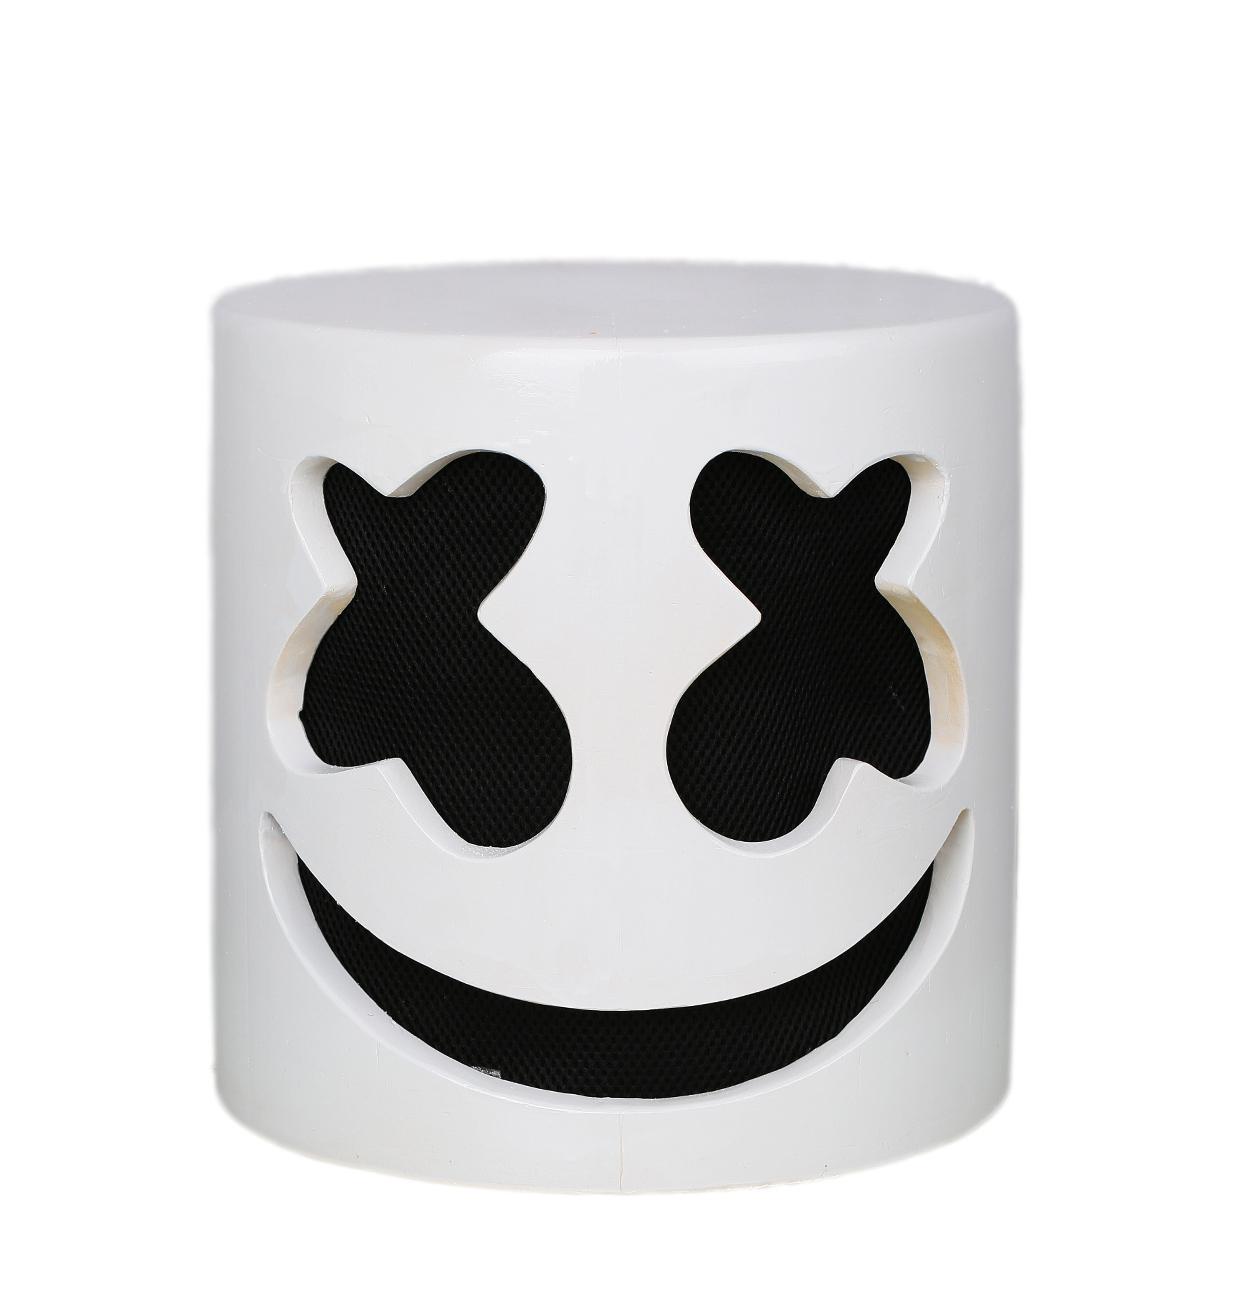 XCOSER Marshmello Helmet Full Head Latex Mask Marshmello Cosplay Mask